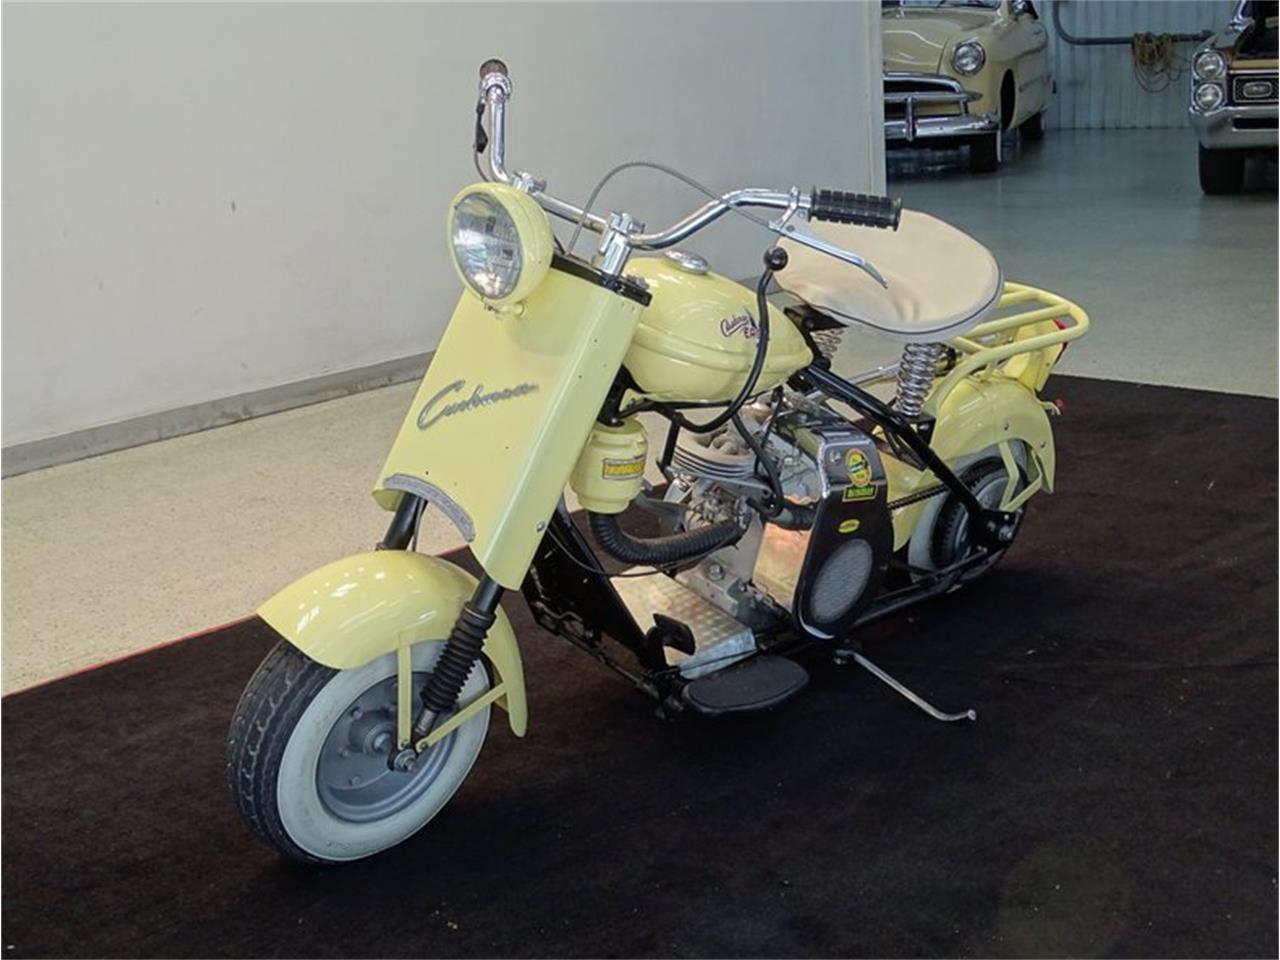 1956 Cushman Motorcycle (CC-1388960) for sale in Greensboro, North Carolina